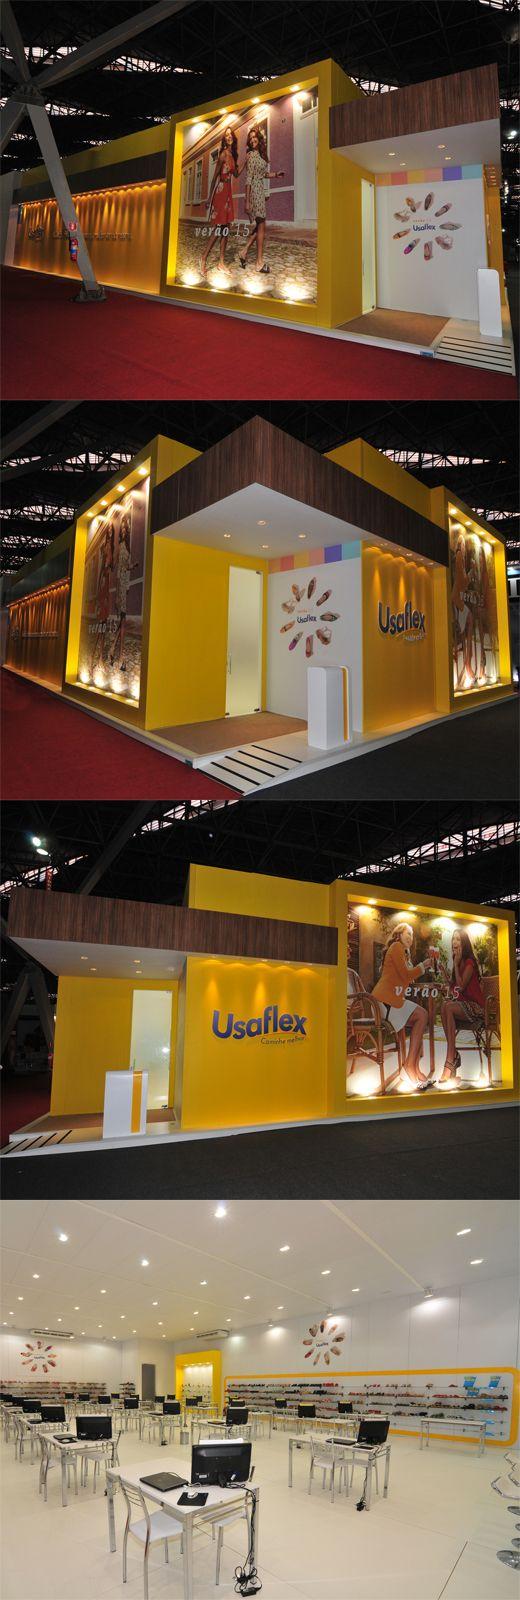 Usaflex - Francal 2014